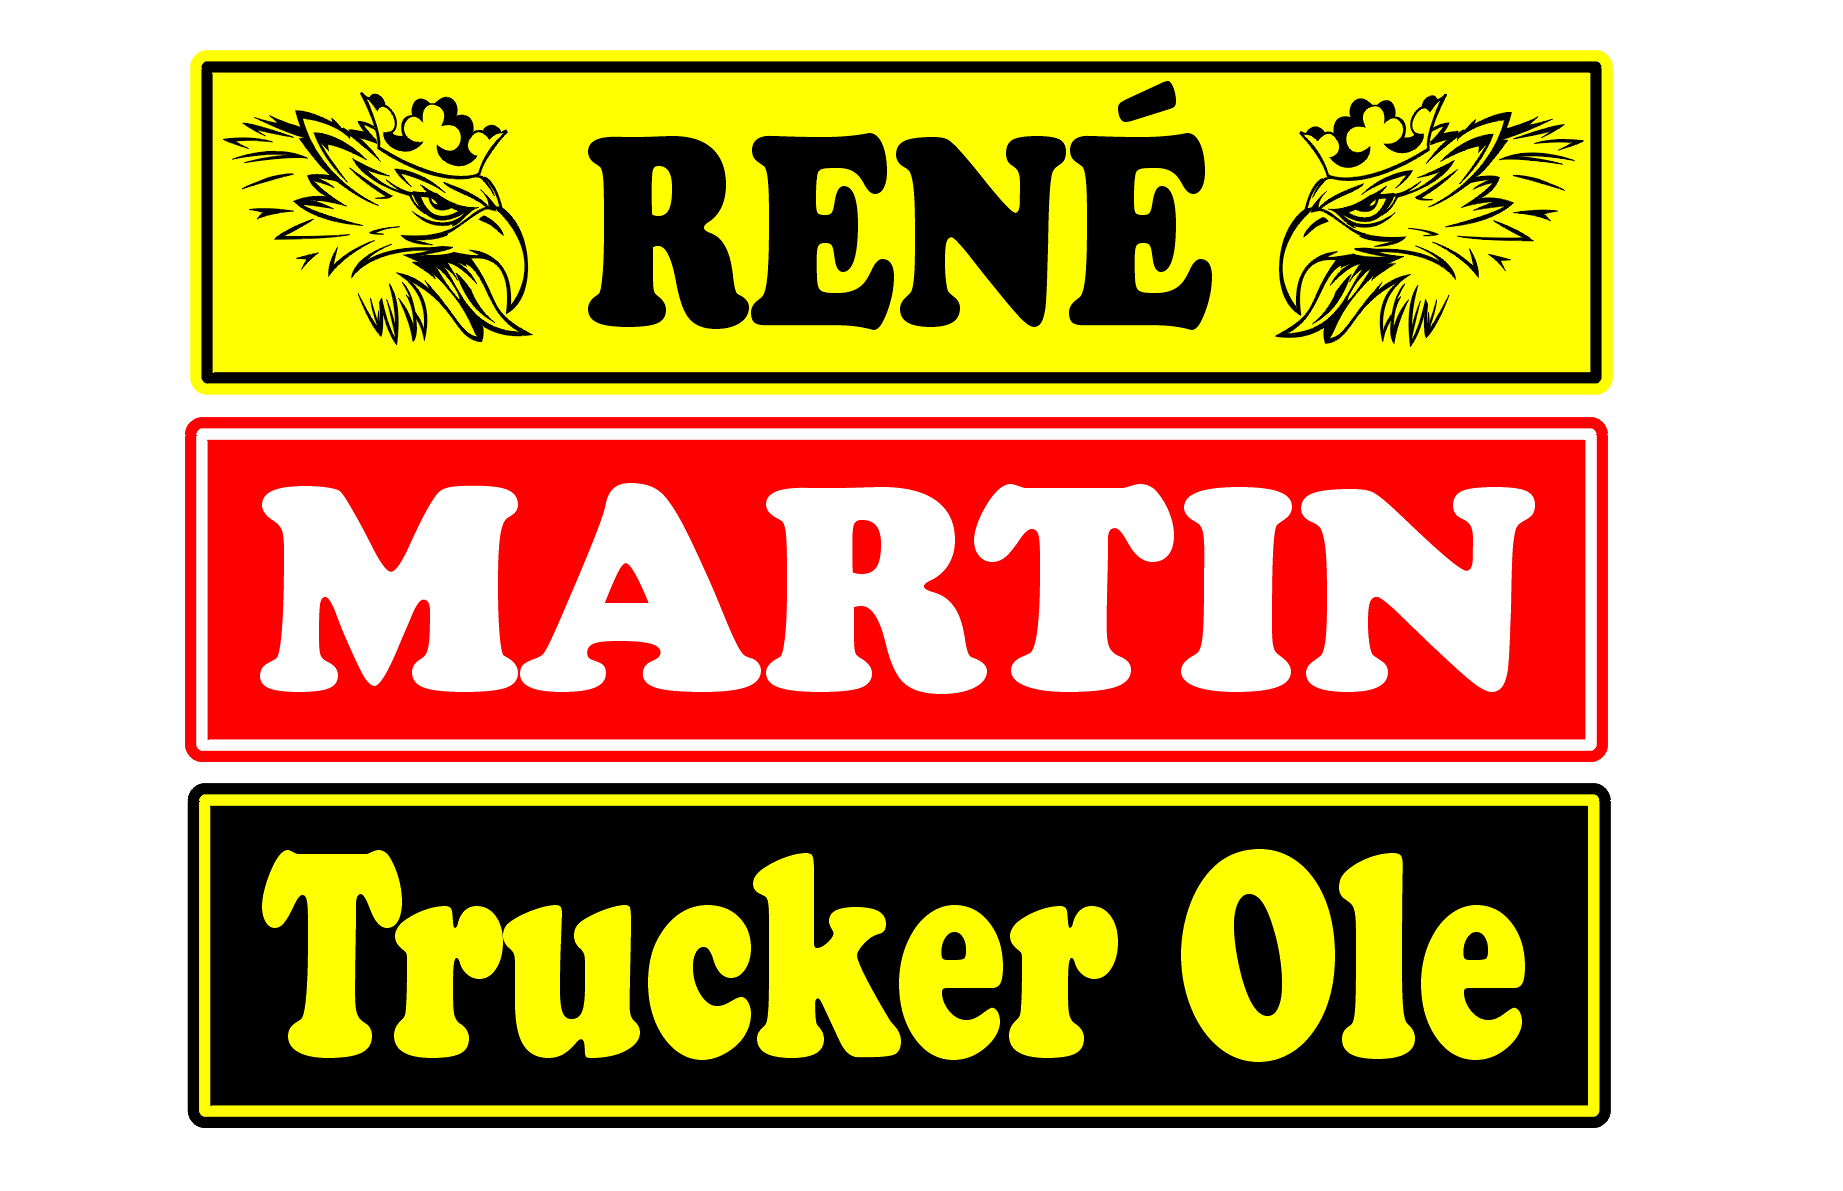 Chaufførskilt, navneskilte til lastbil, skilte med tekst, trucker skilte, Truckerskilt, X Chaufførskilt med bil logo